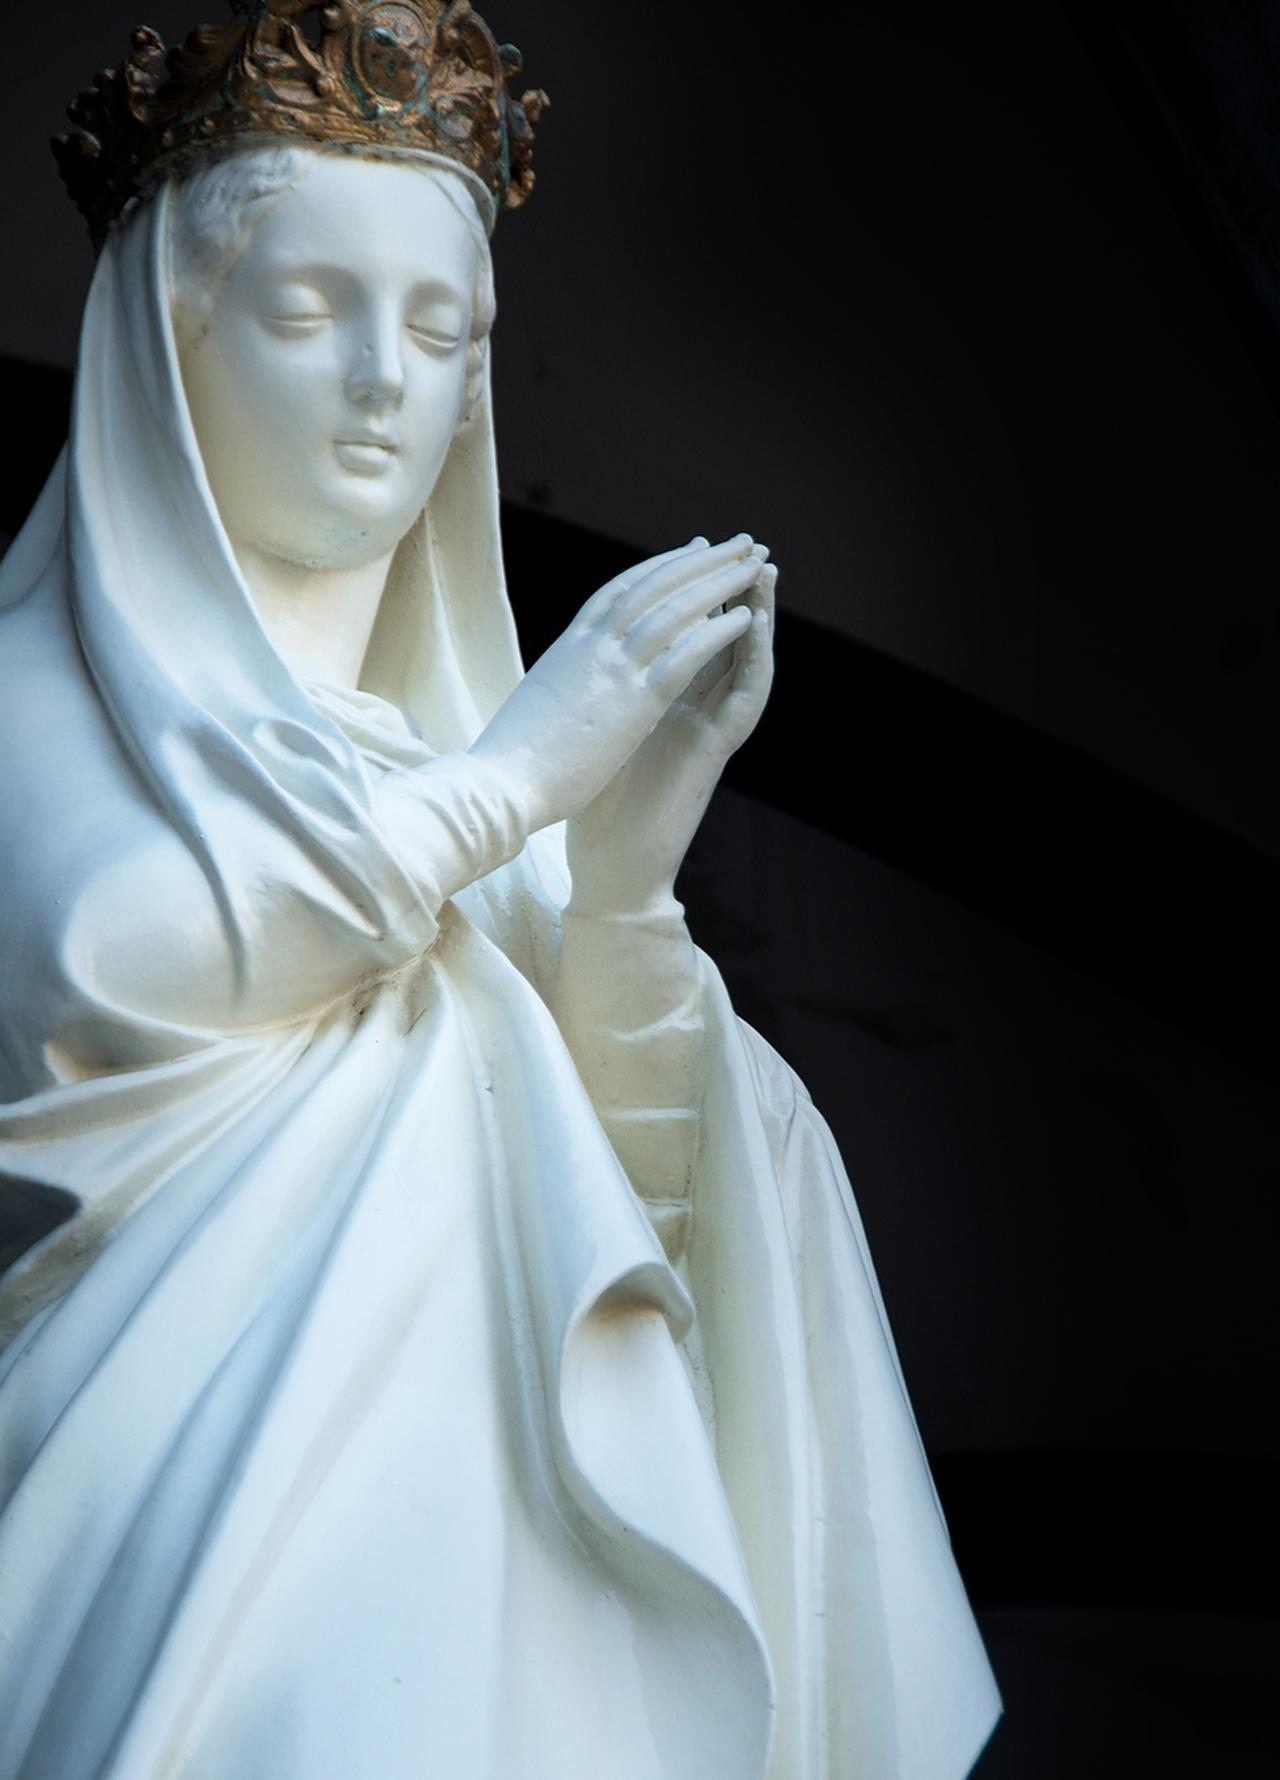 Images : 3番目の画像 - 「私的な旅遺産<Vol.2> 長崎、世界遺産の教会で」のアルバム - T JAPAN:The New York Times Style Magazine 公式サイト